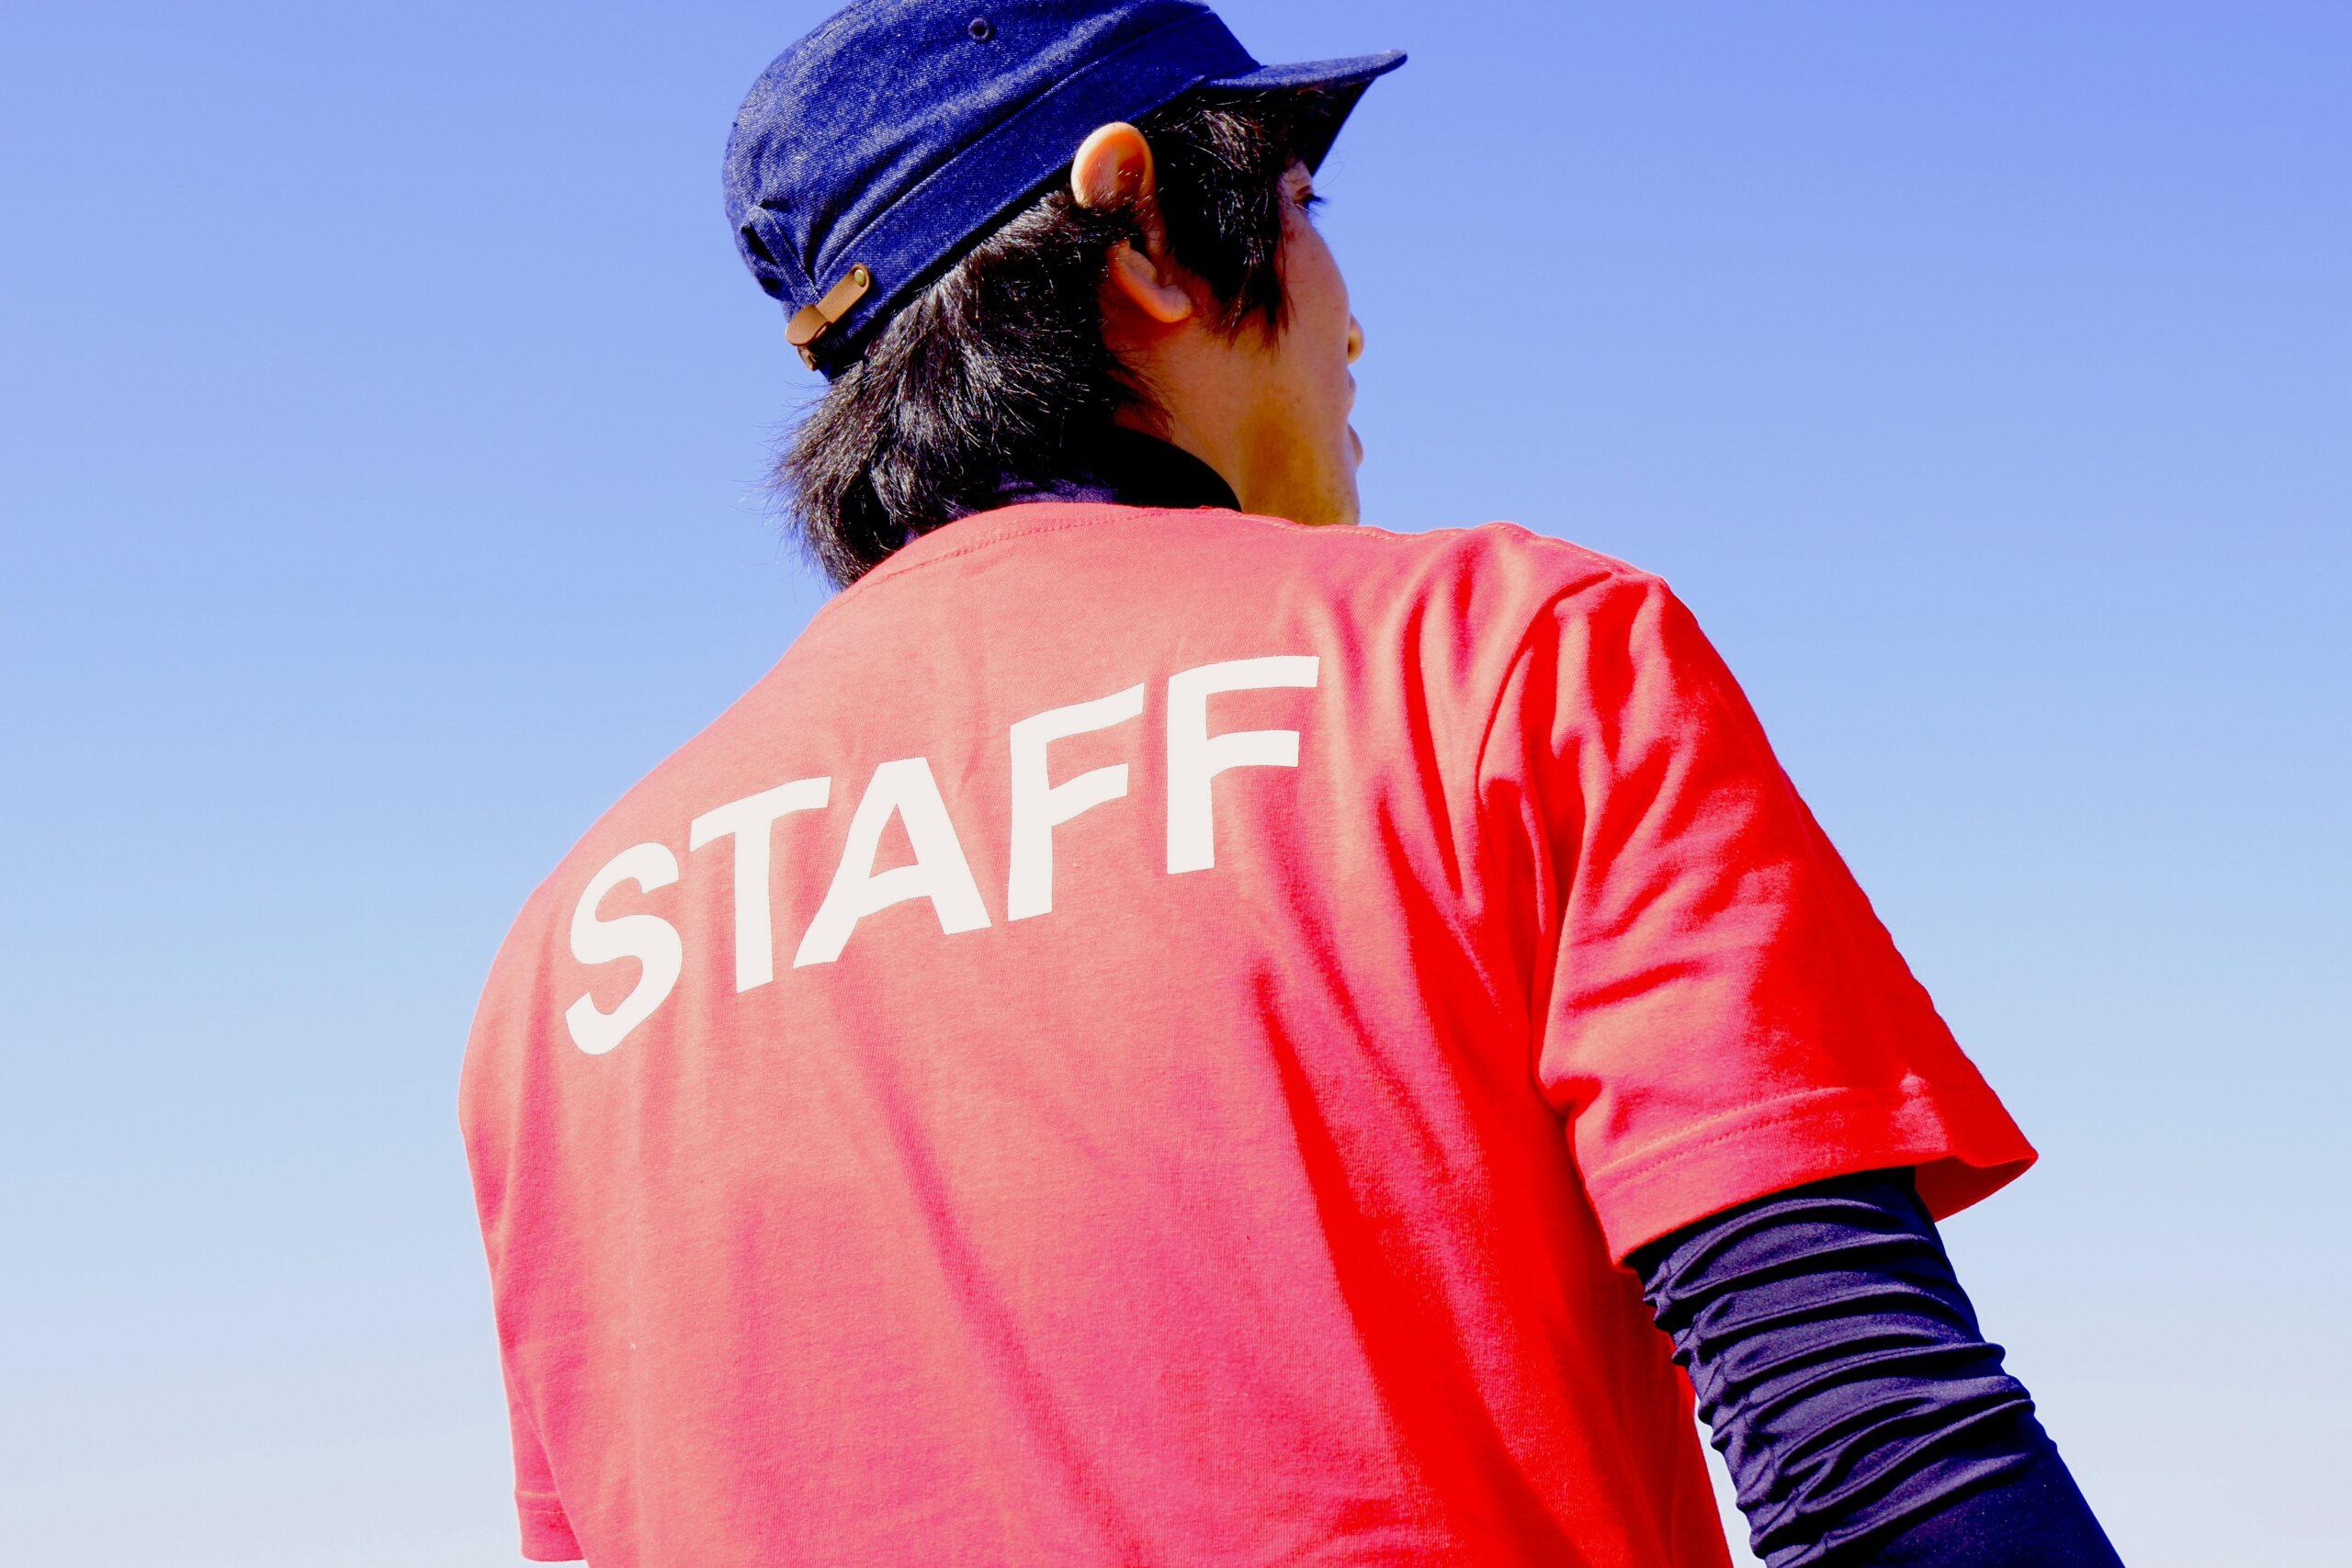 Man wearing a red Staff shirt